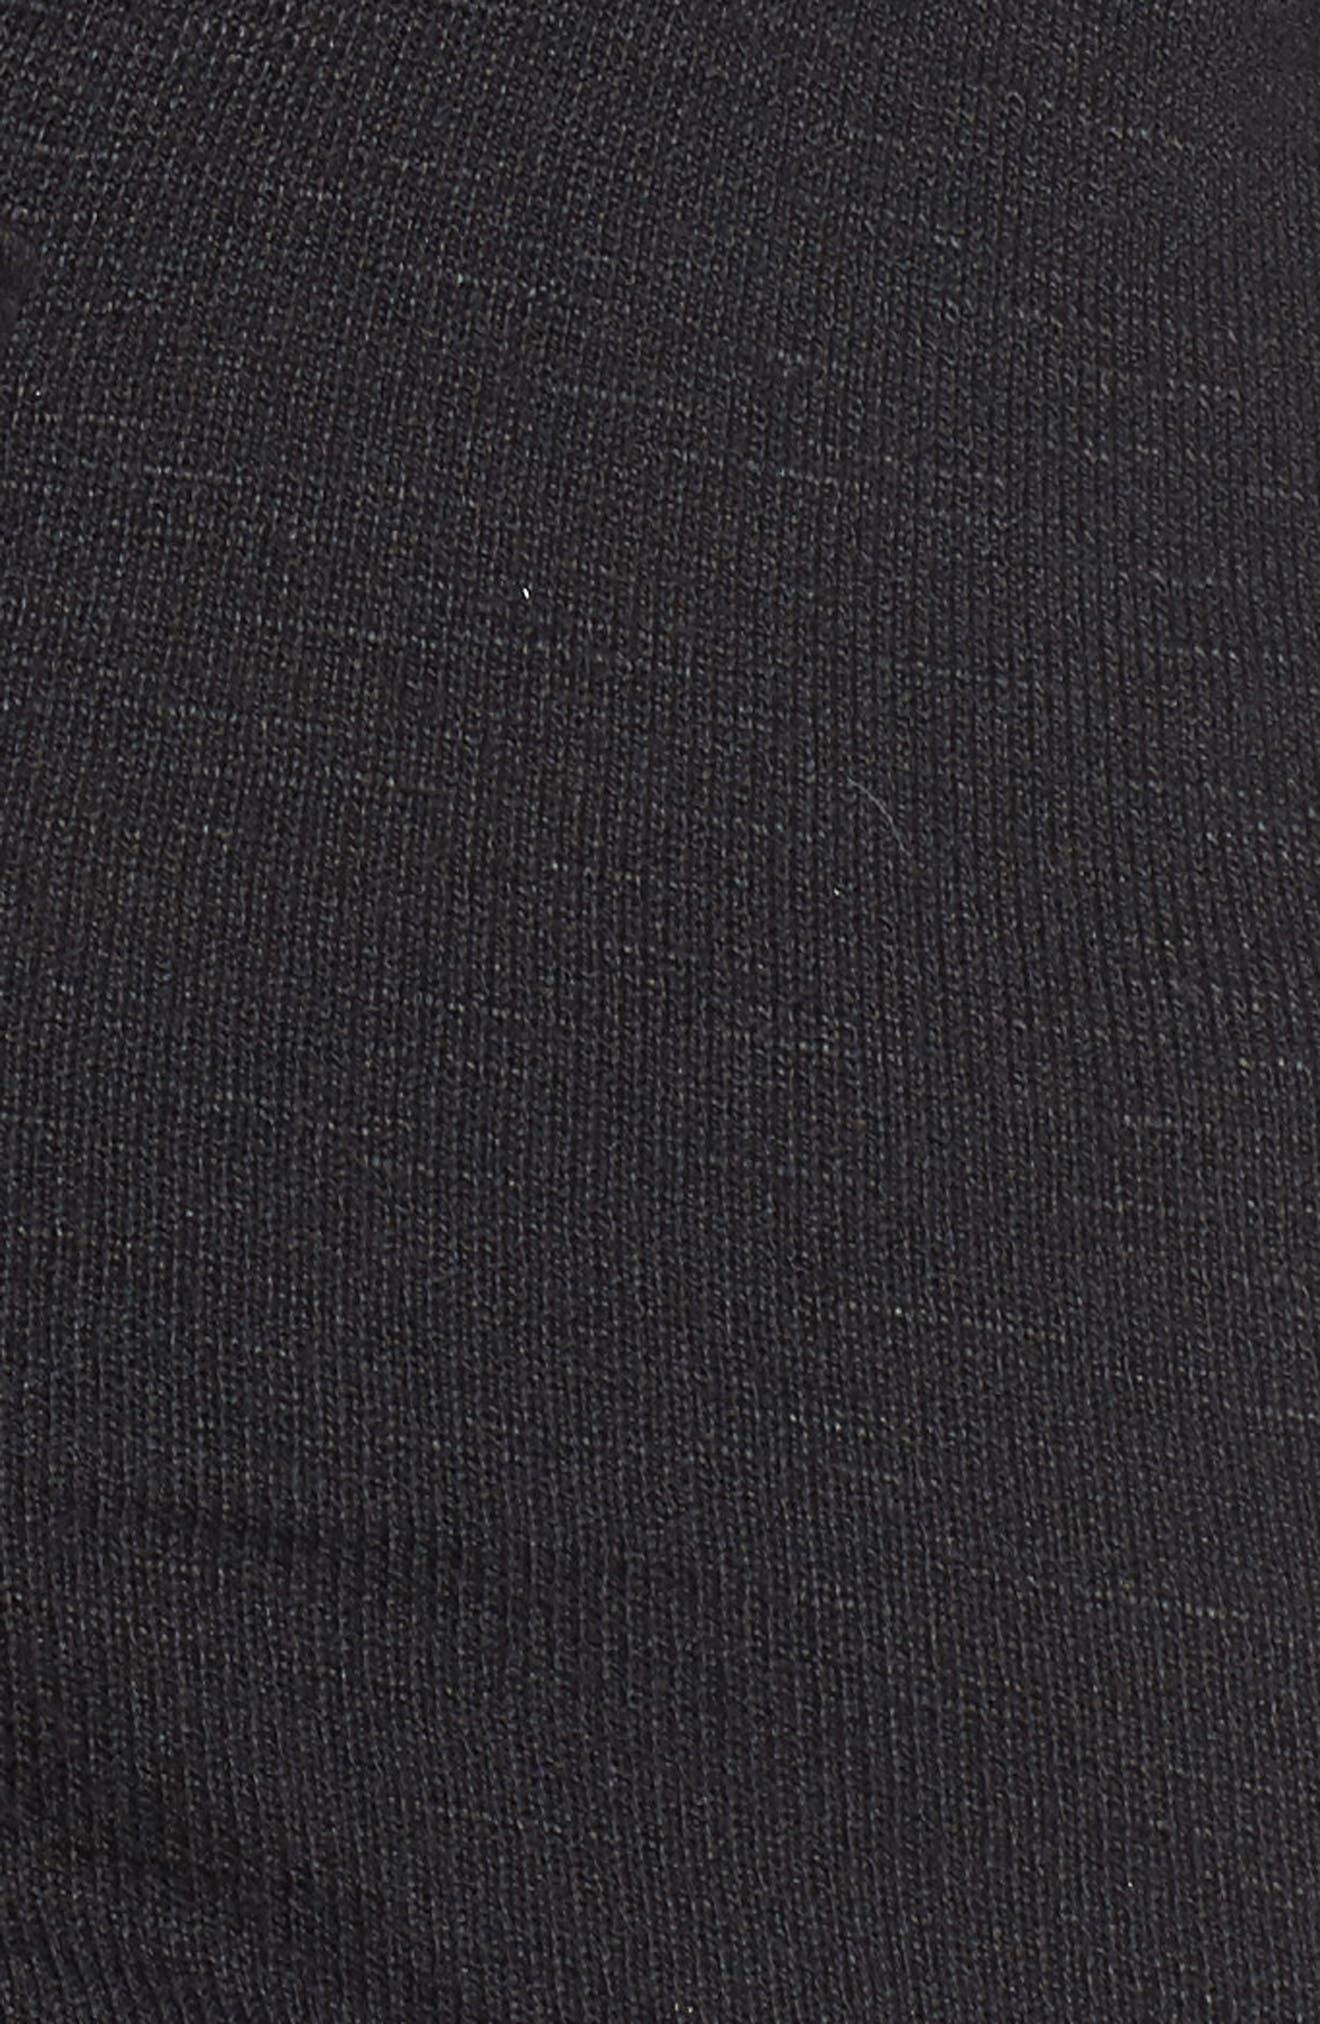 Hatchi Corset Tee,                             Alternate thumbnail 5, color,                             001